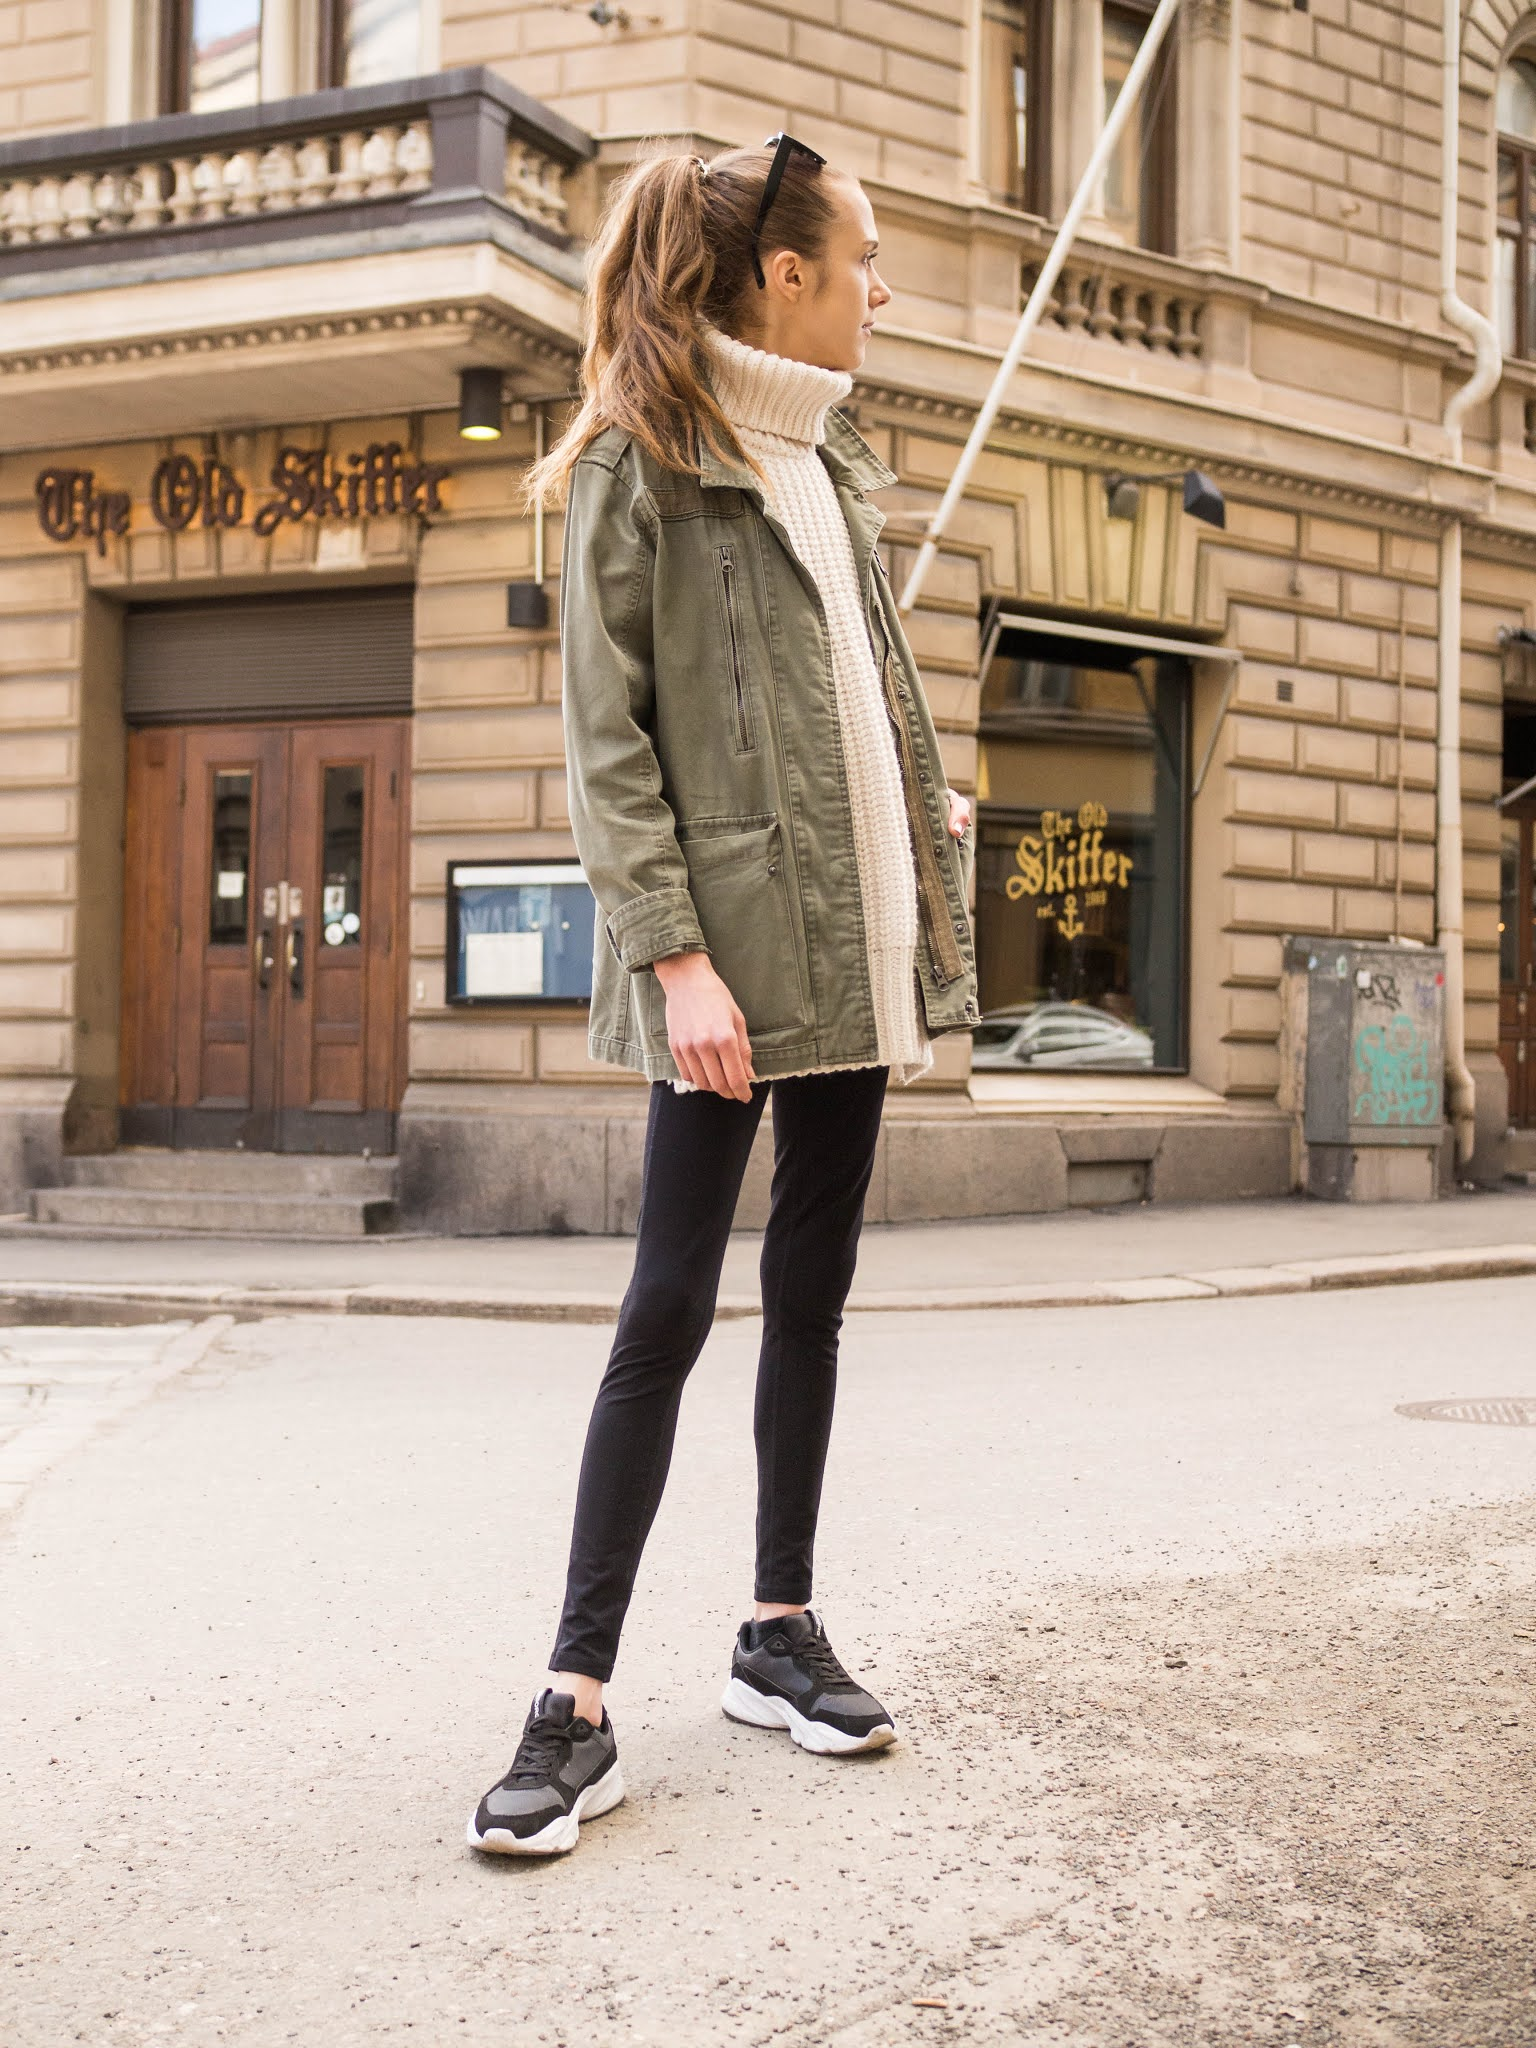 Kevään muoti-inspiraatio // Spring outfit inspiration